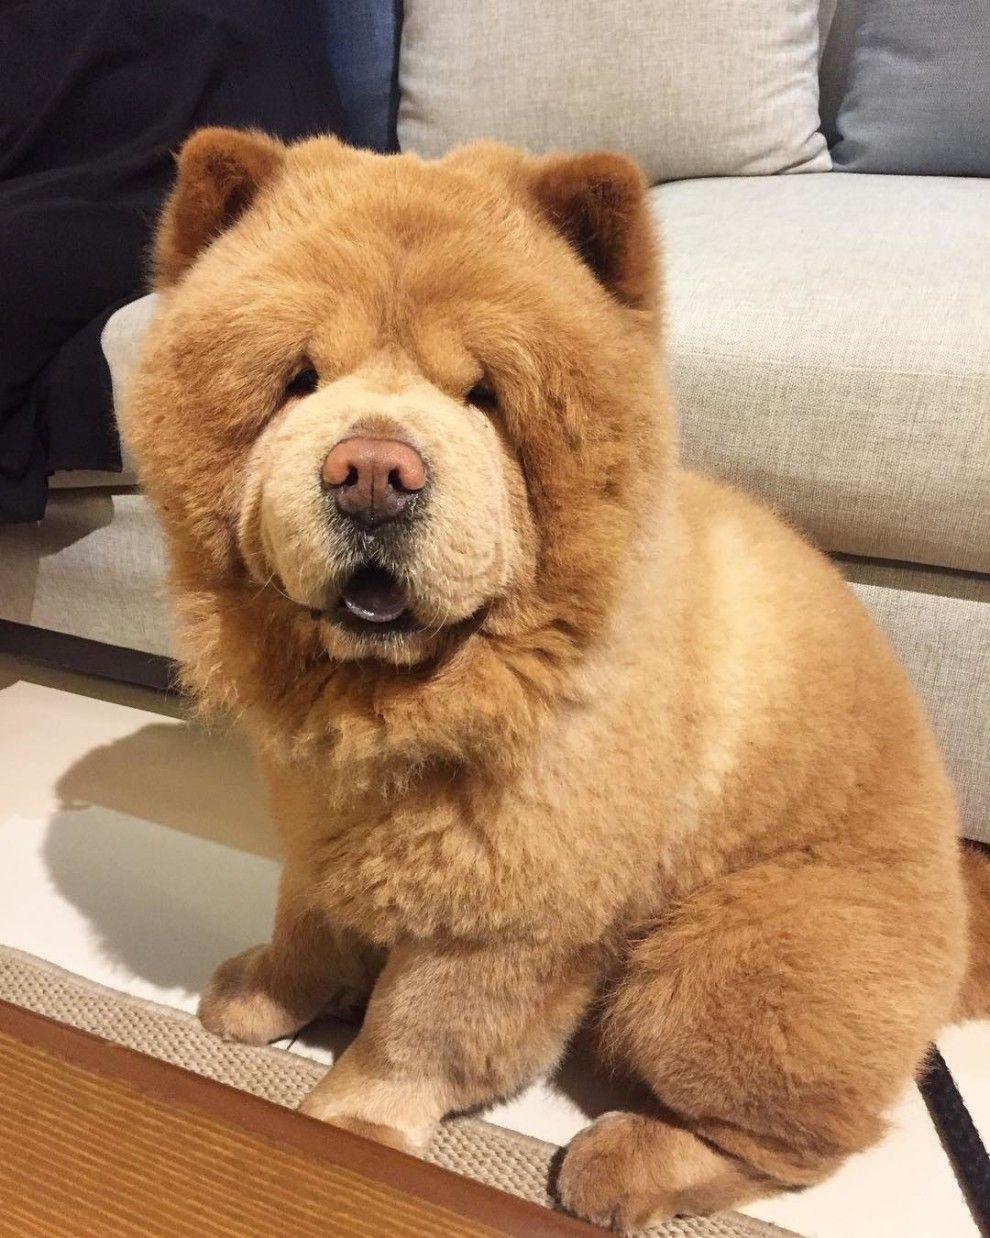 Simple Bear Brown Adorable Dog - e7eeaa745db0828da6ee0b99c8c395db  Image_589012  .jpg